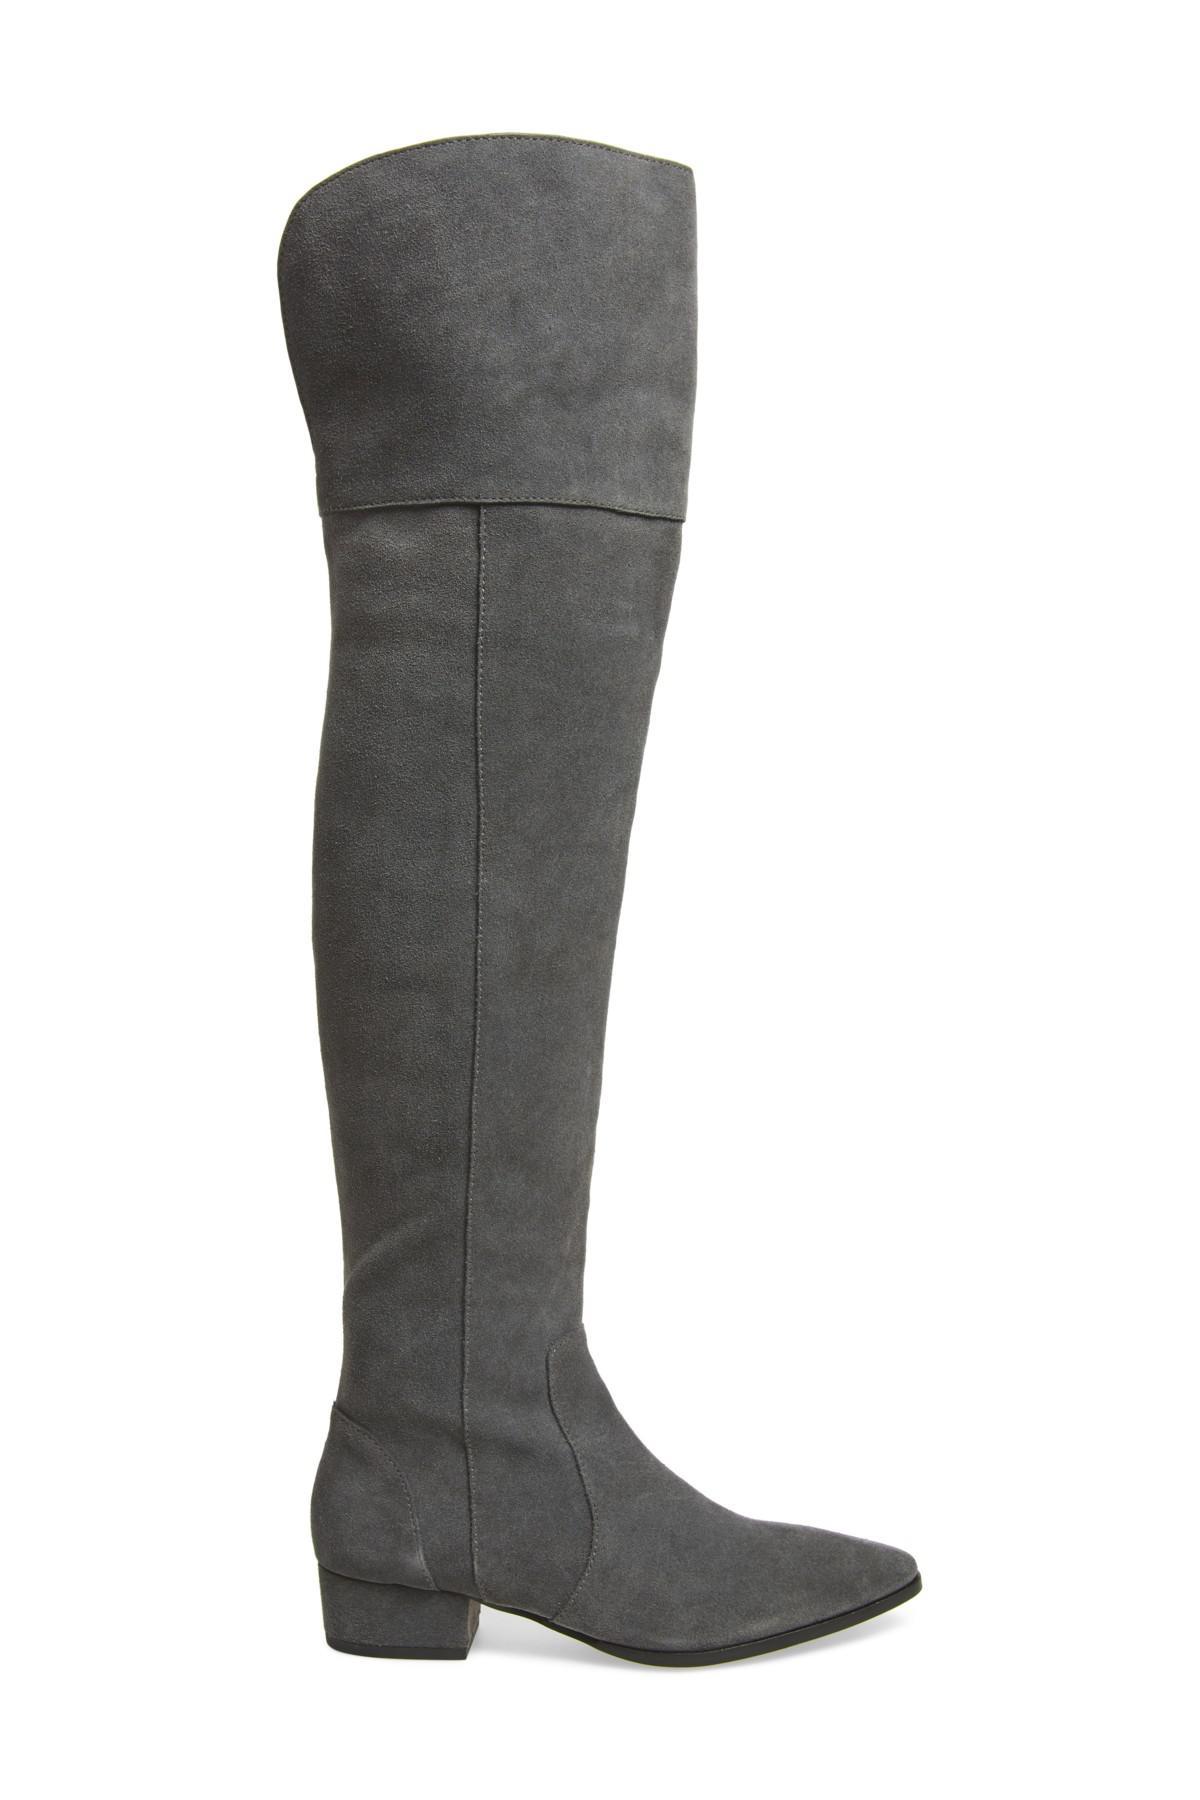 dabcb7b179c Lyst - Splendid Ruby Over The Knee Boot (women) in Gray